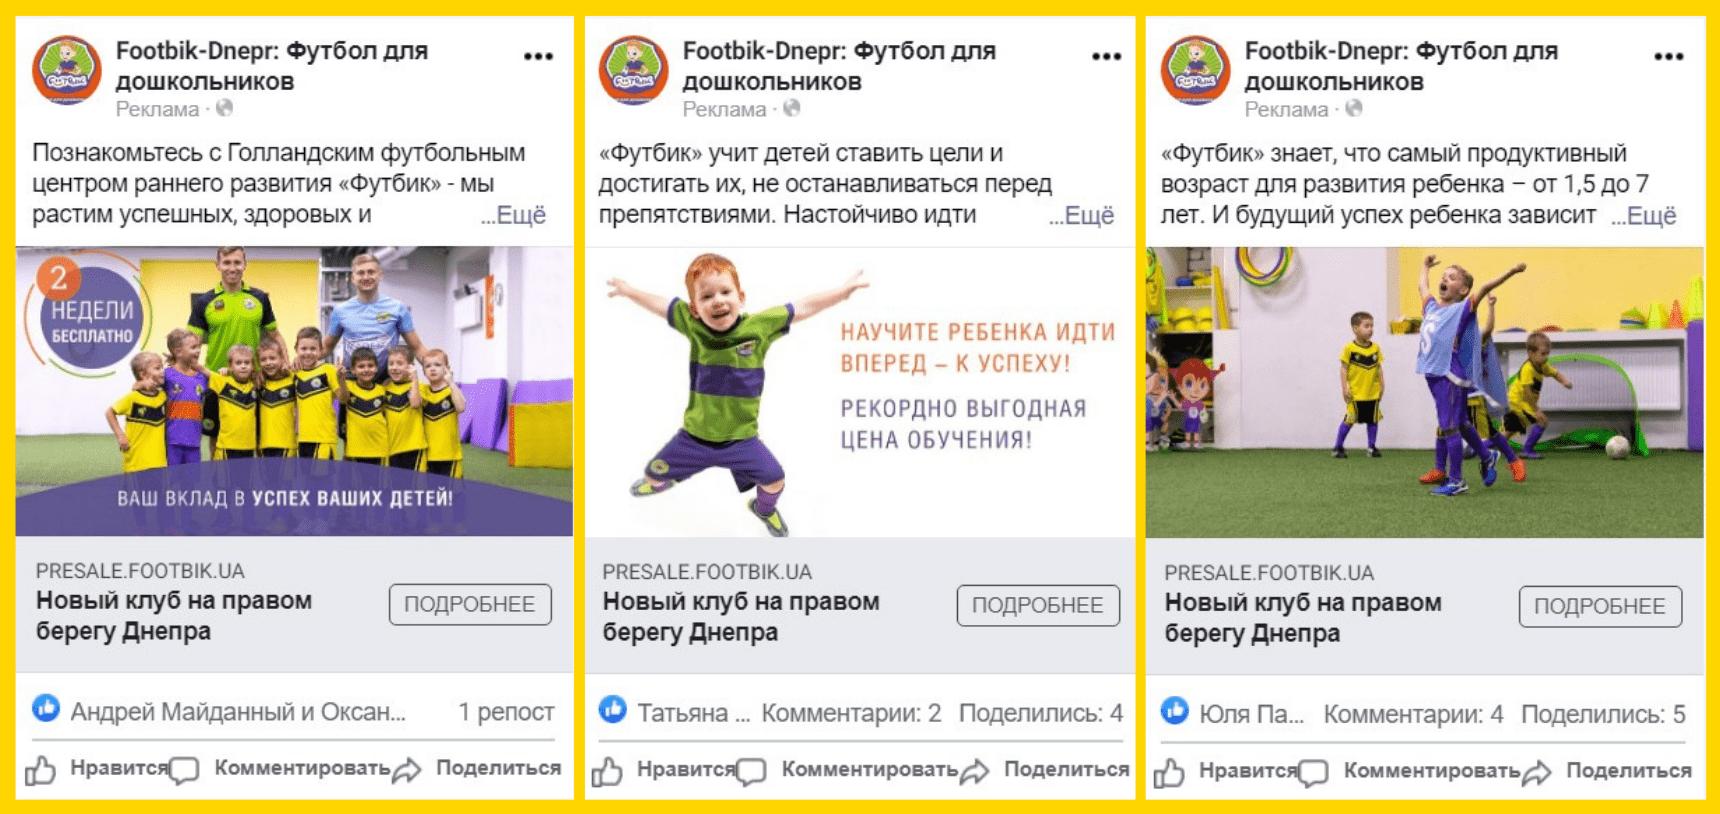 Footbik - таргетированная реклама